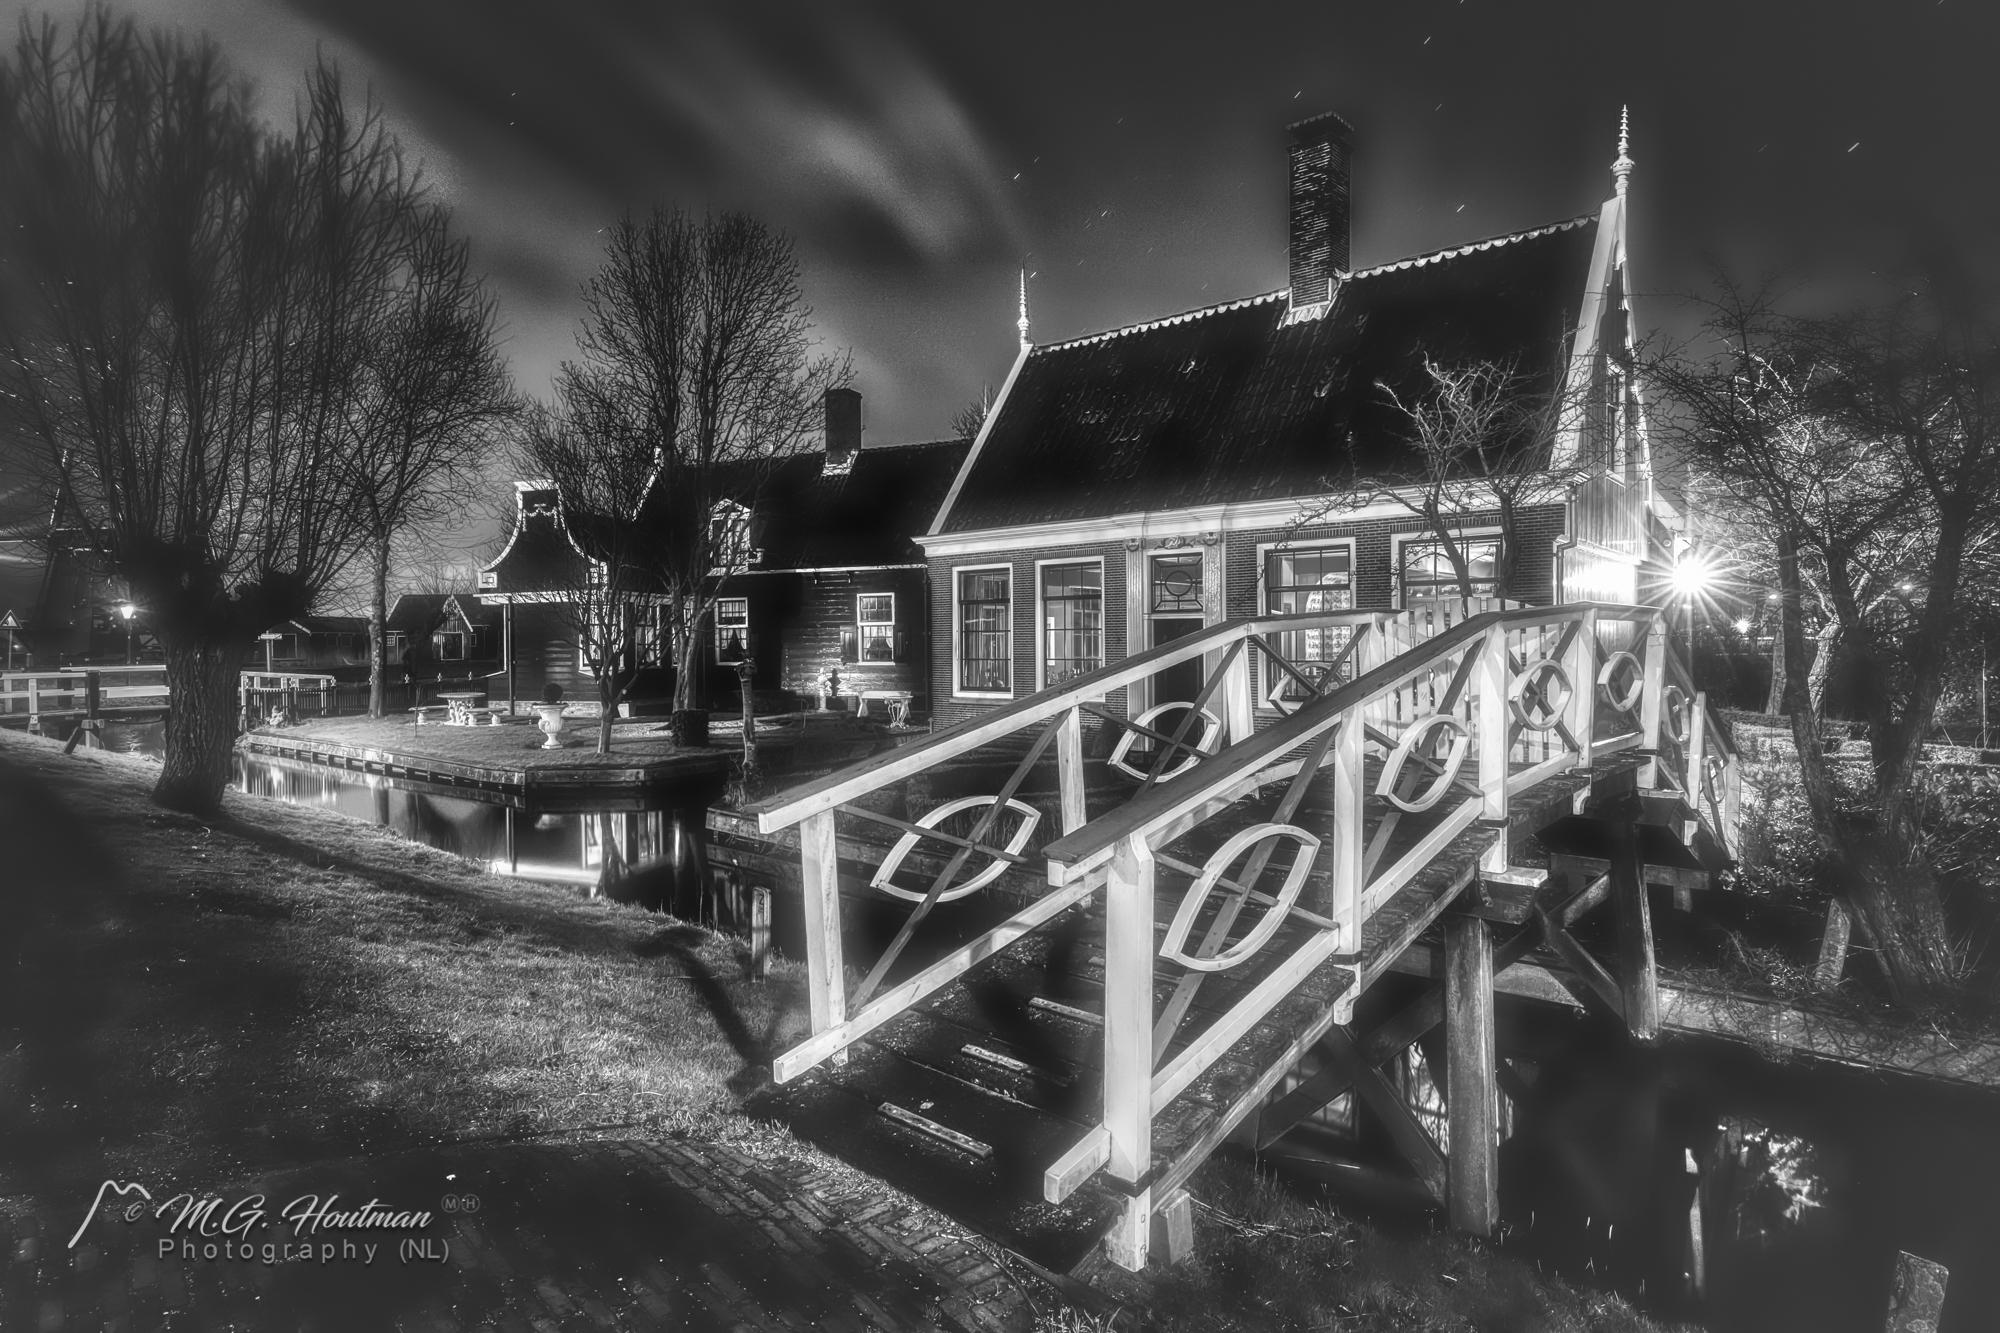 Zaanse Schans @ Night - B/W (NL)